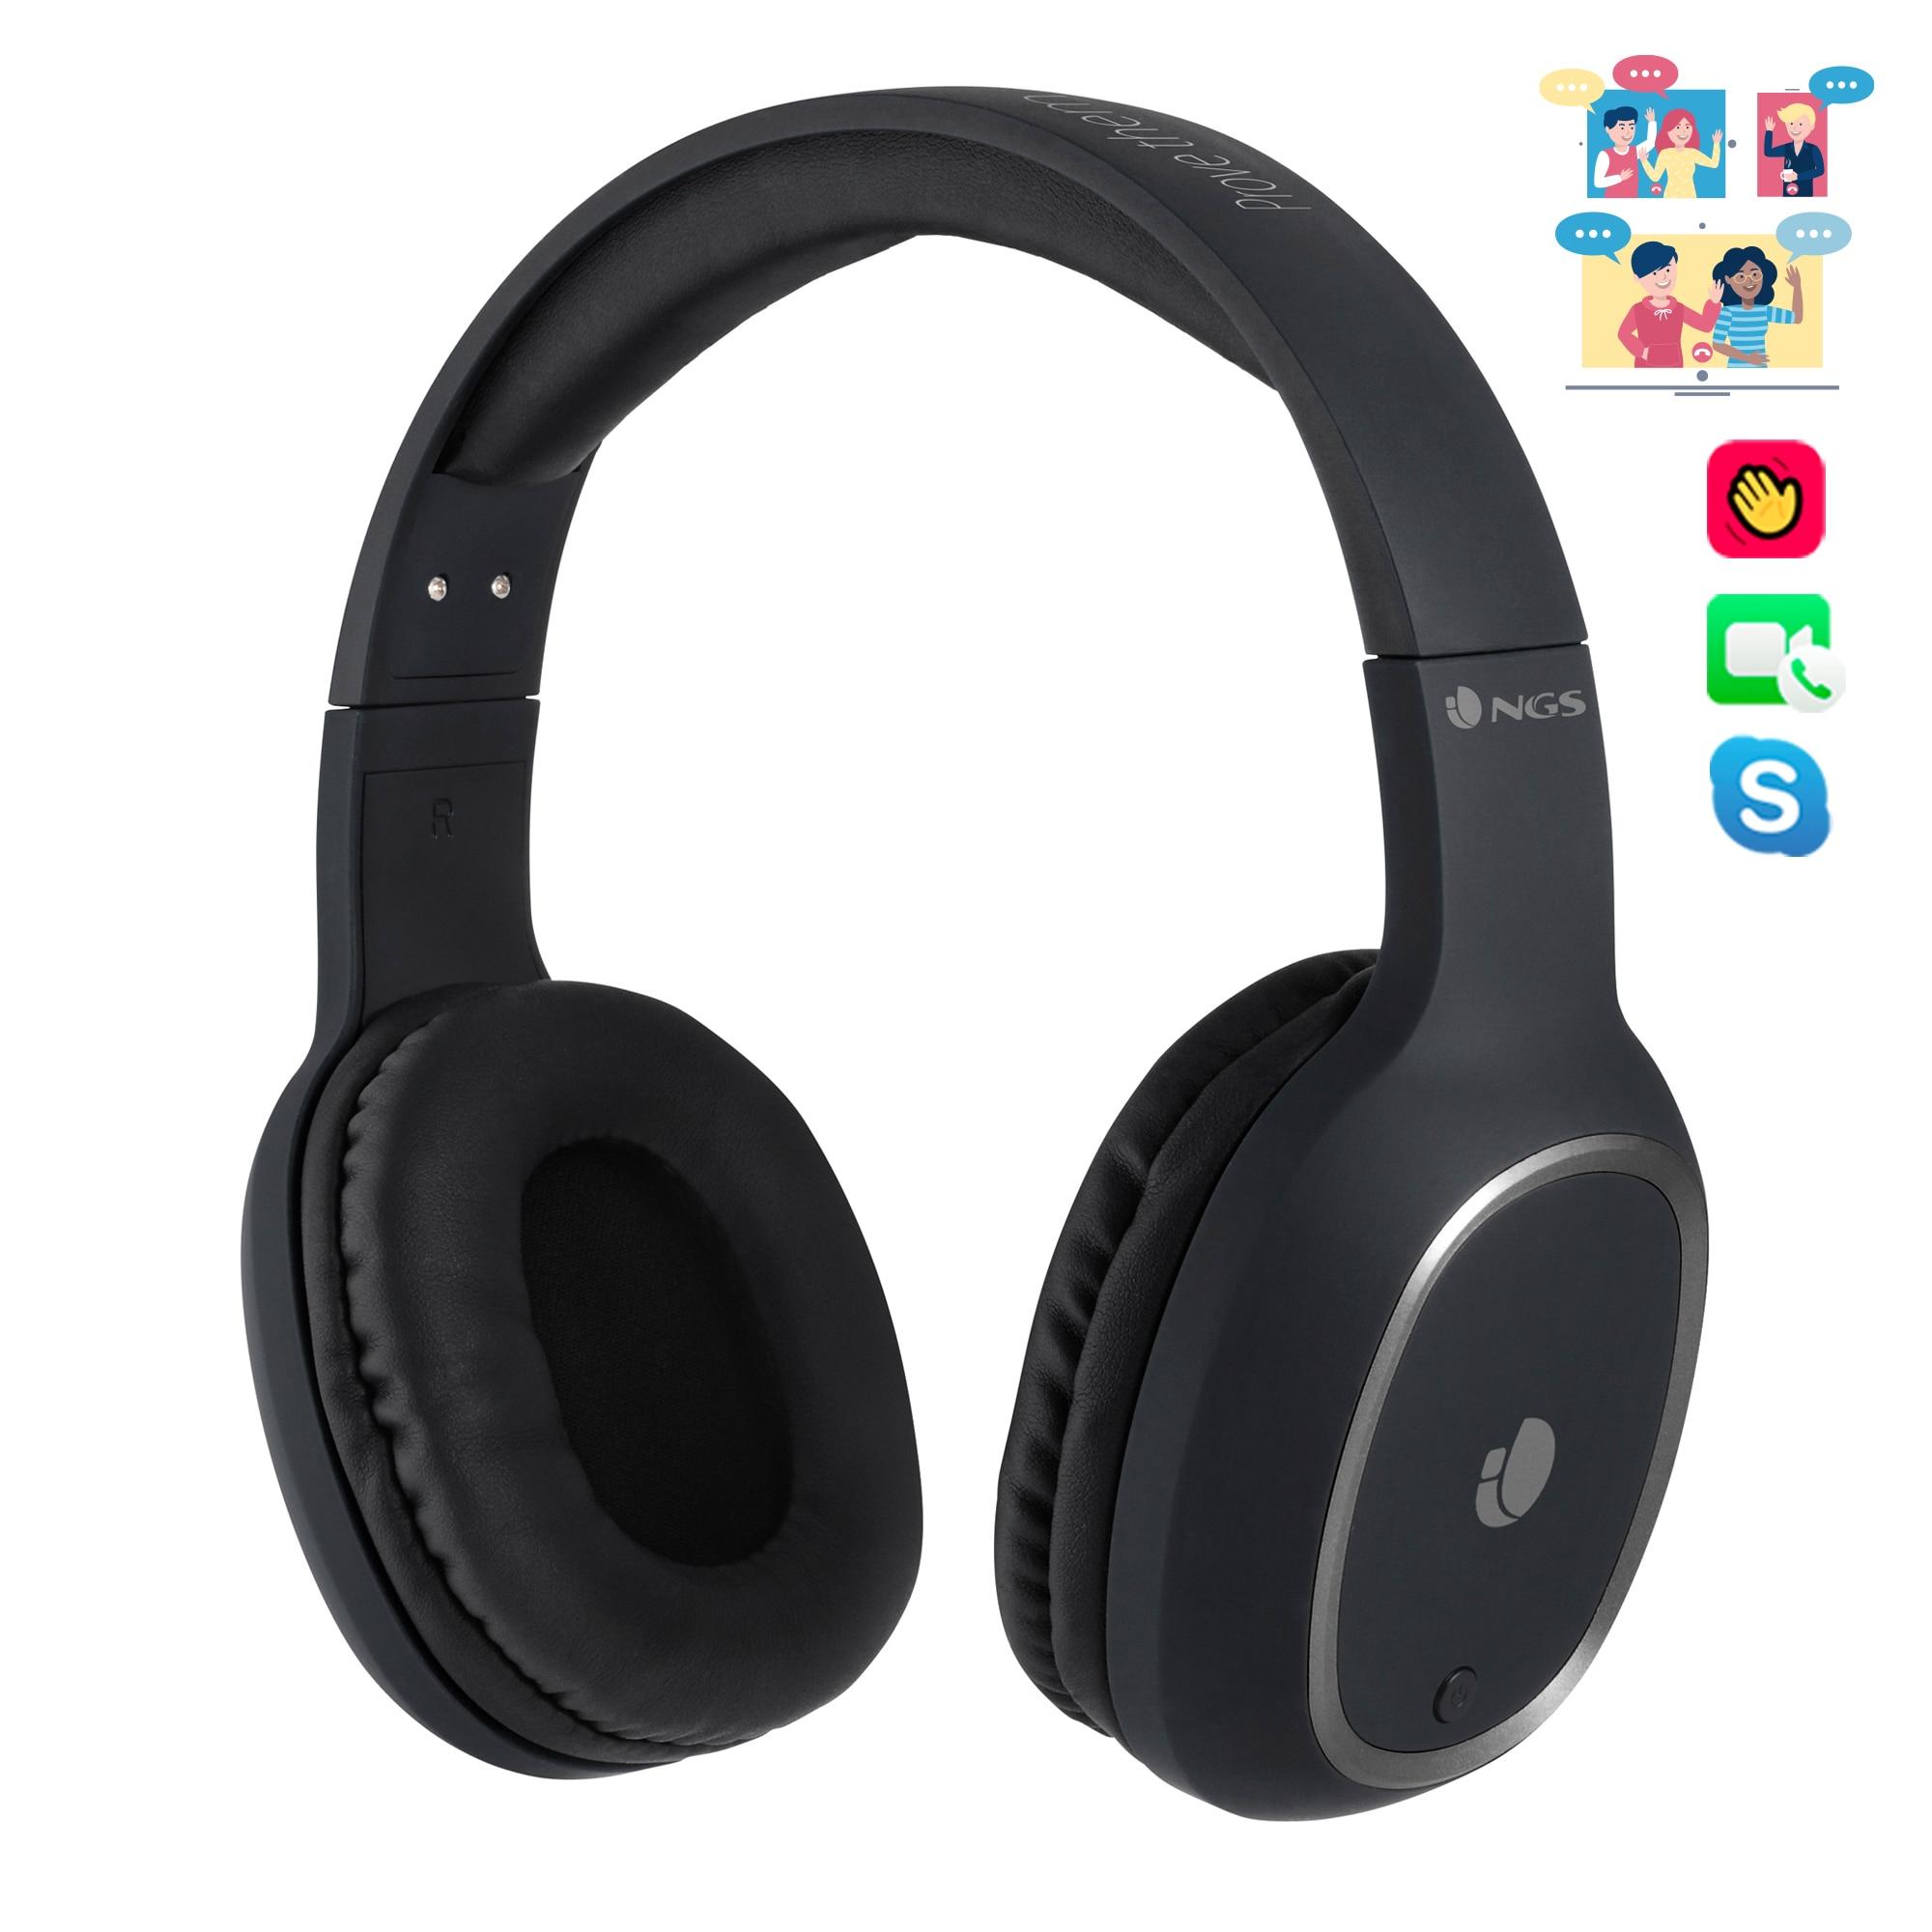 NGS Artica Pride-Headphones Headband, Stereo, Wireless, Bluetooth, Microphone, 7 Hours Autonomy, Manos Free Shipping